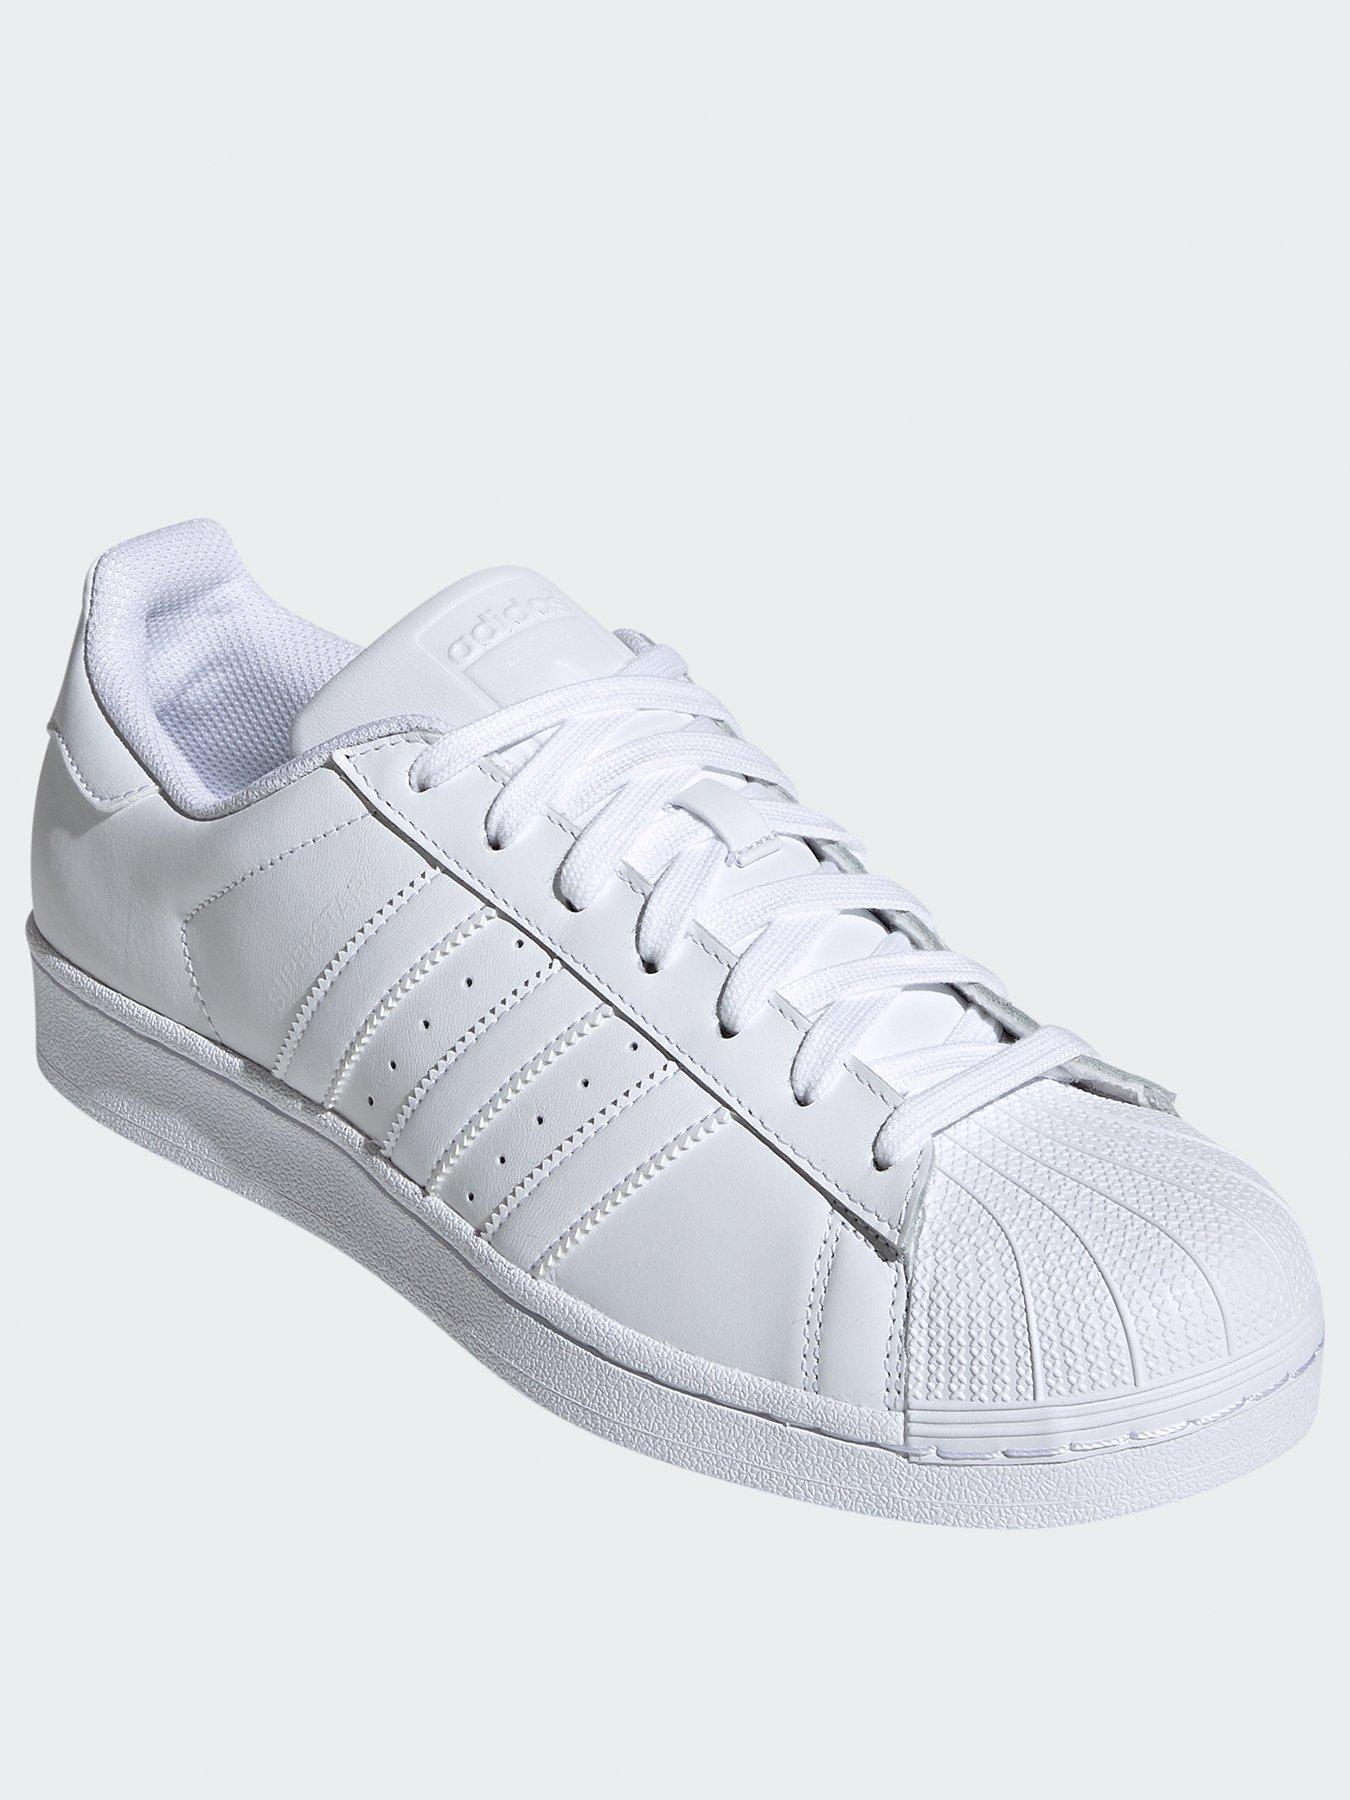 Adidas Sportswear Clearance Sale | Littlewoods Ireland Online